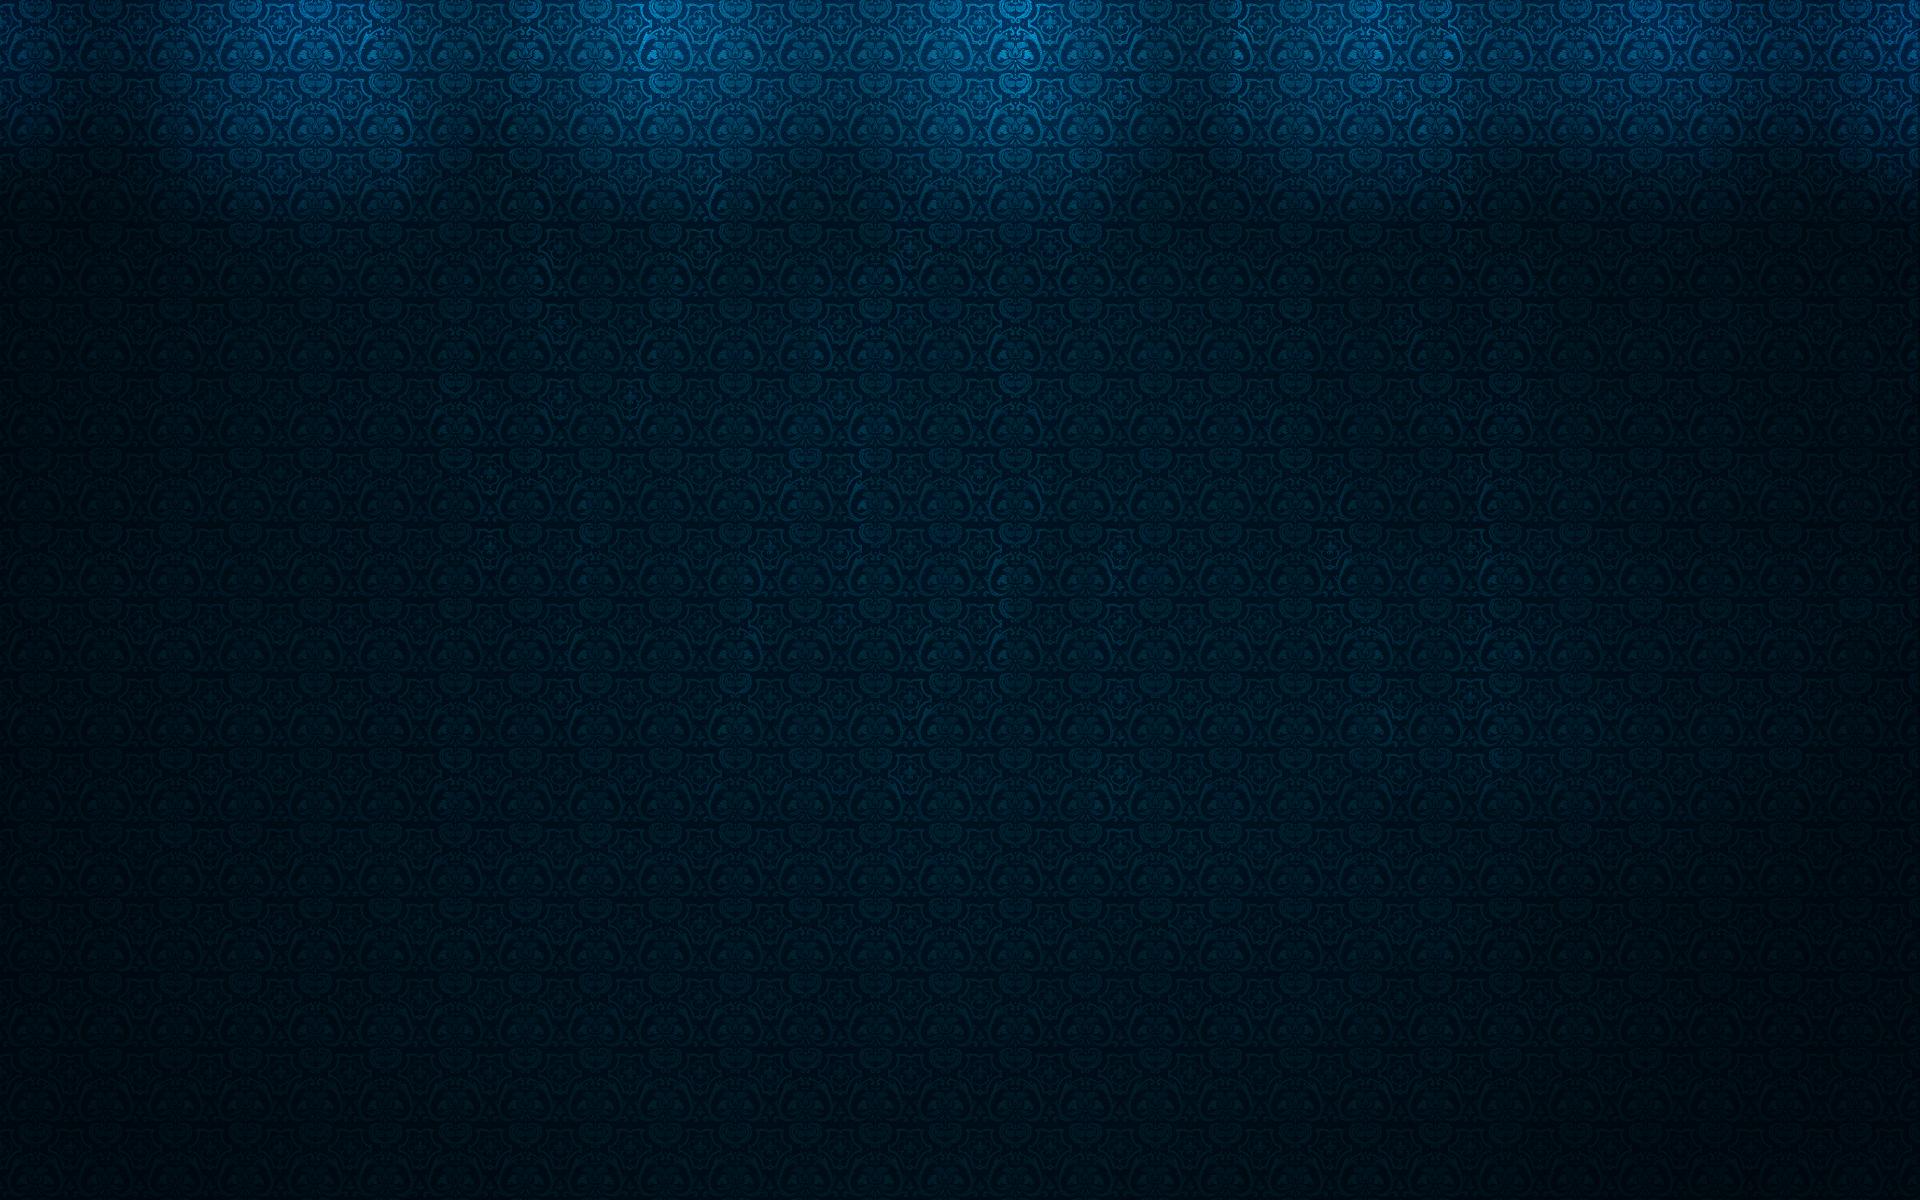 Dark Blue Wallpaper High Quality 1920x1200